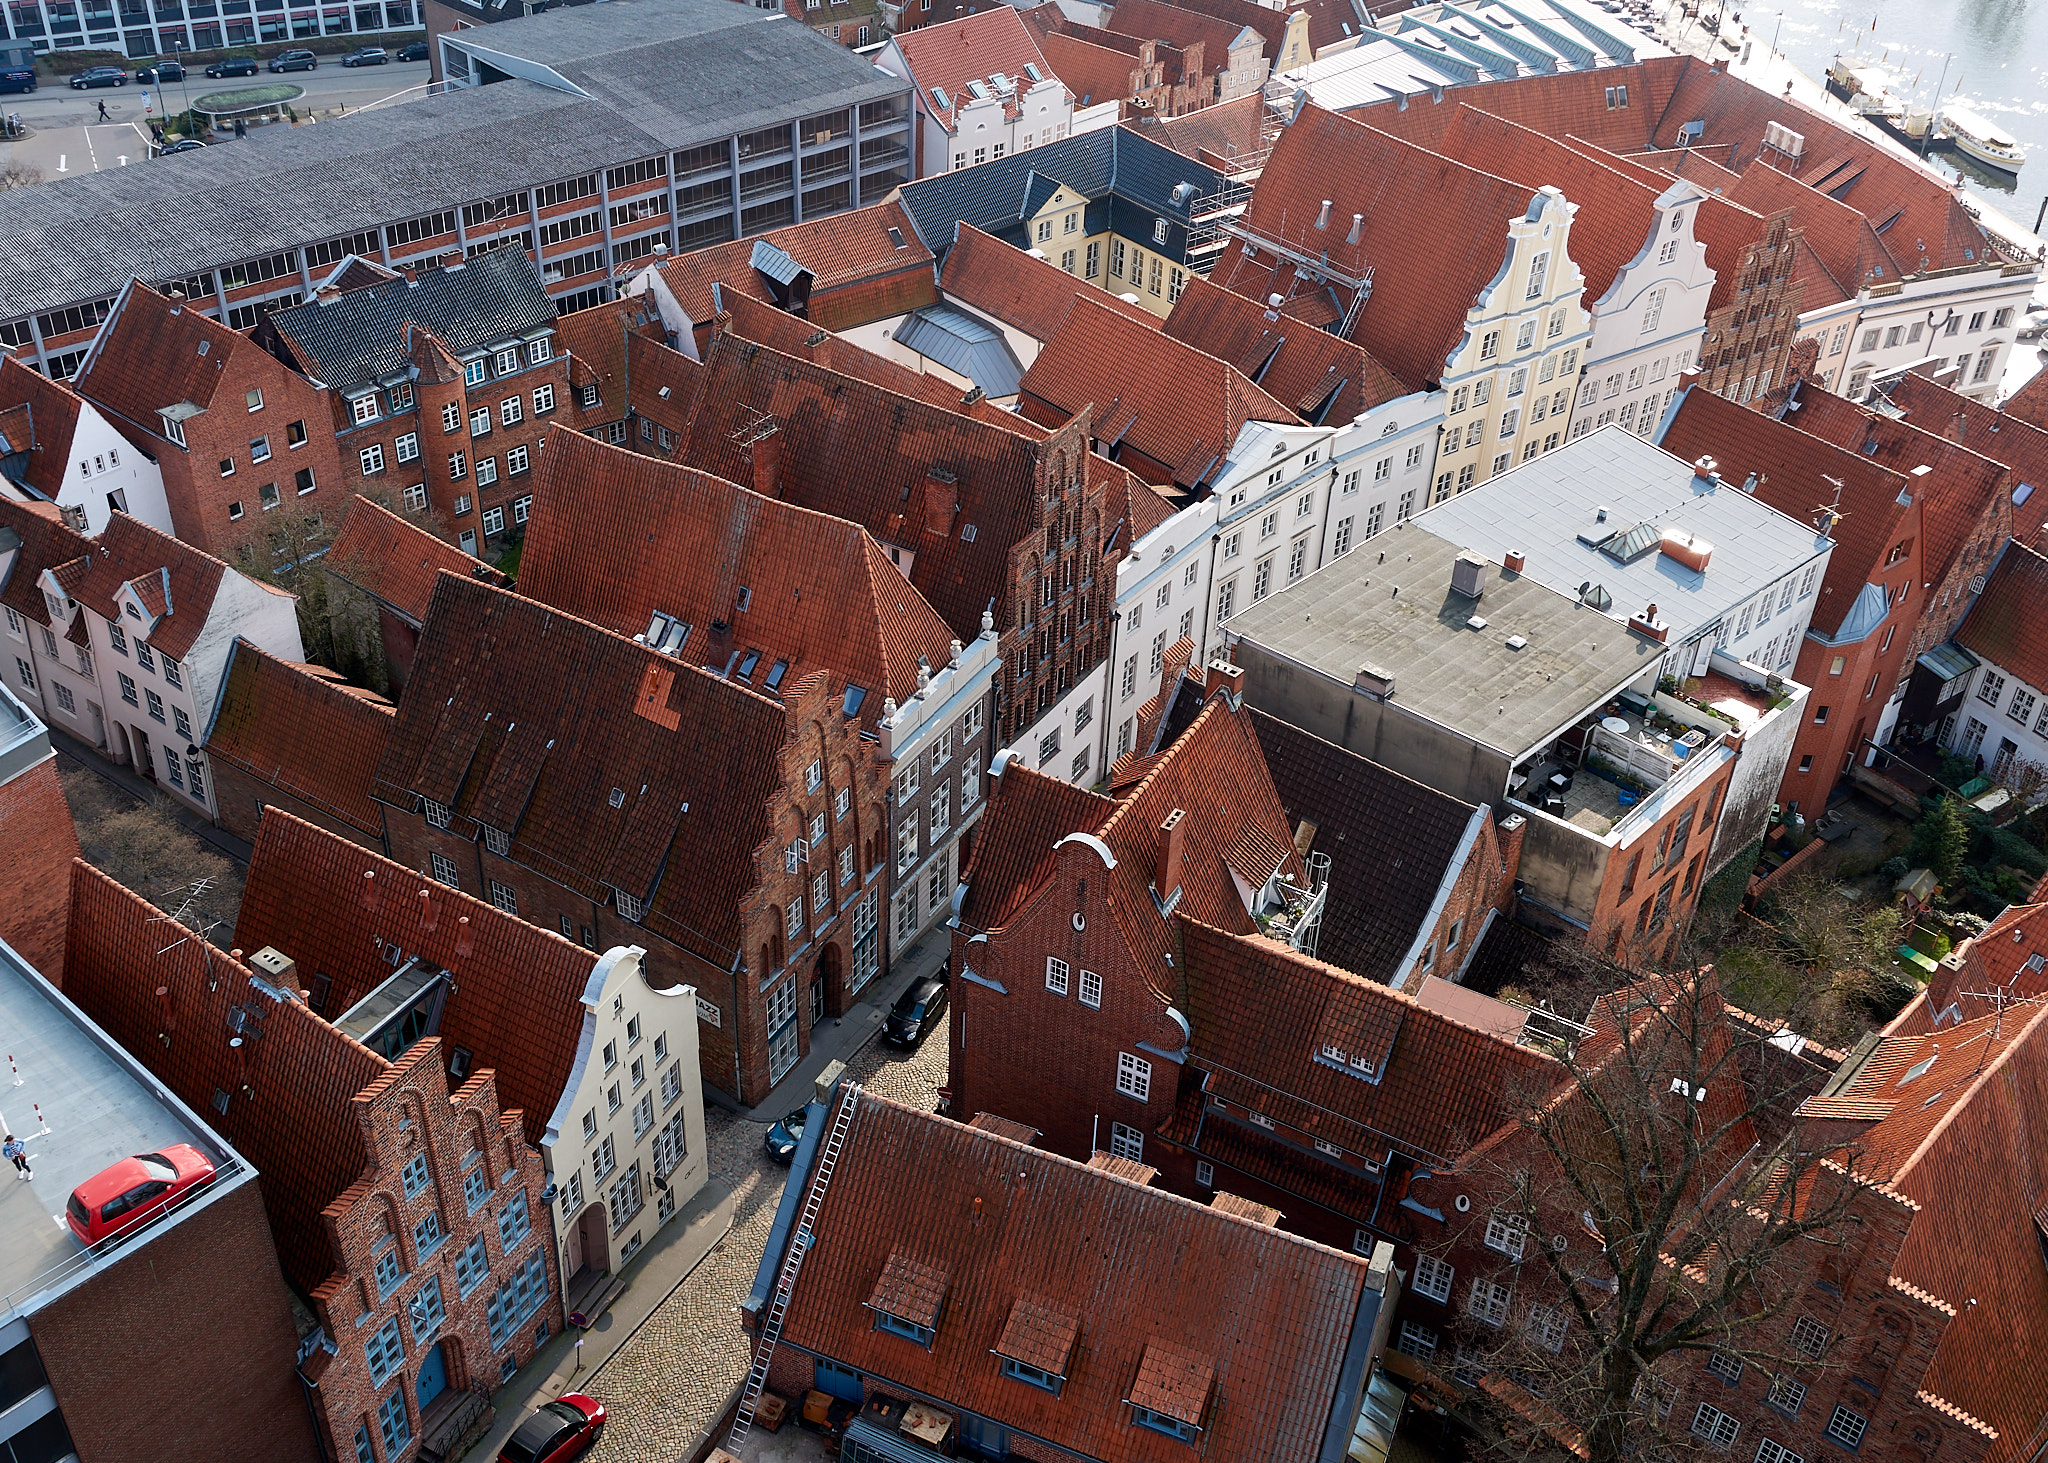 20190330-Lübeck-277.jpg